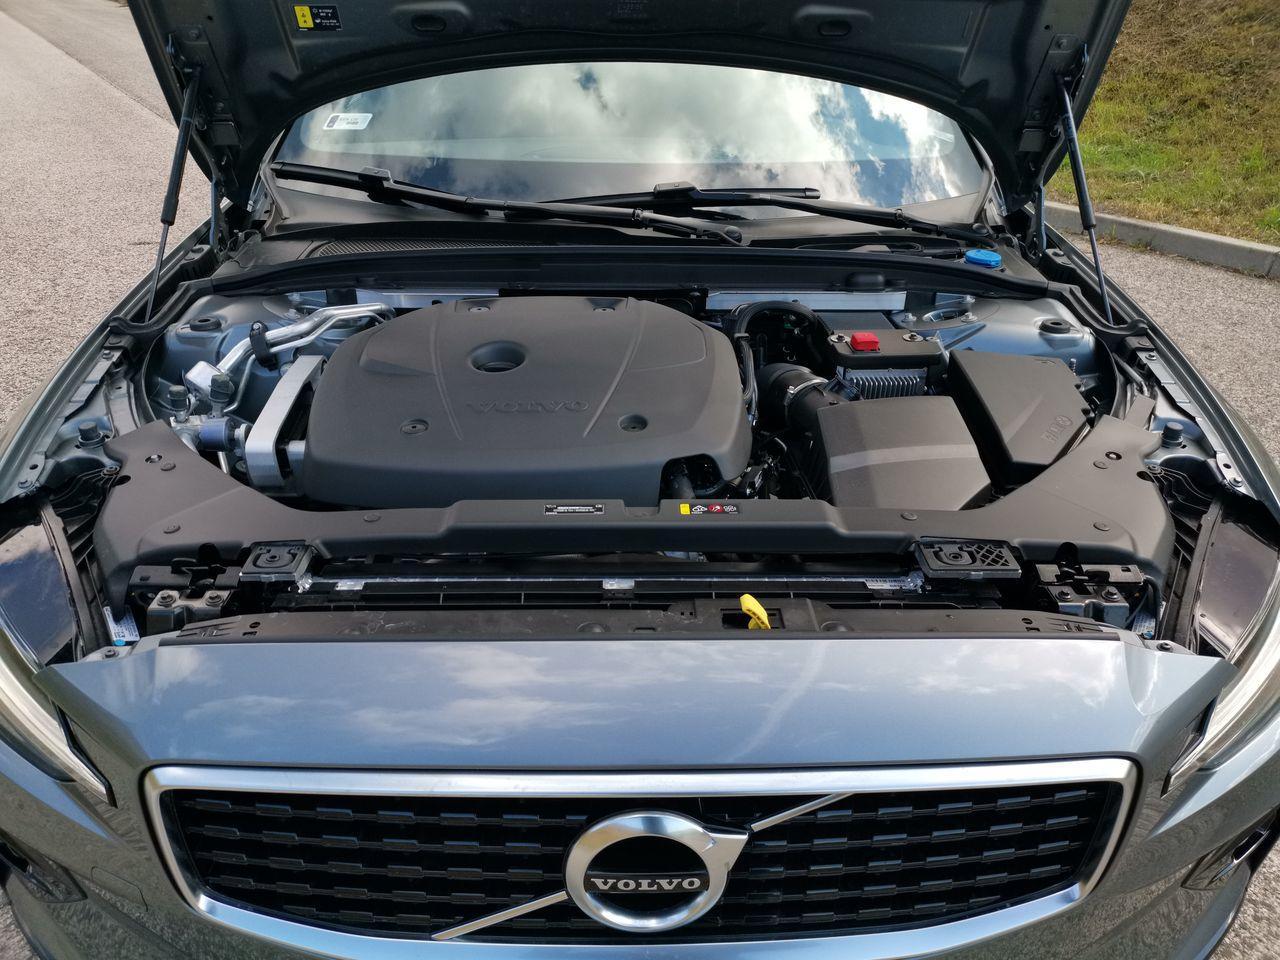 Volvo S60 T5 motor